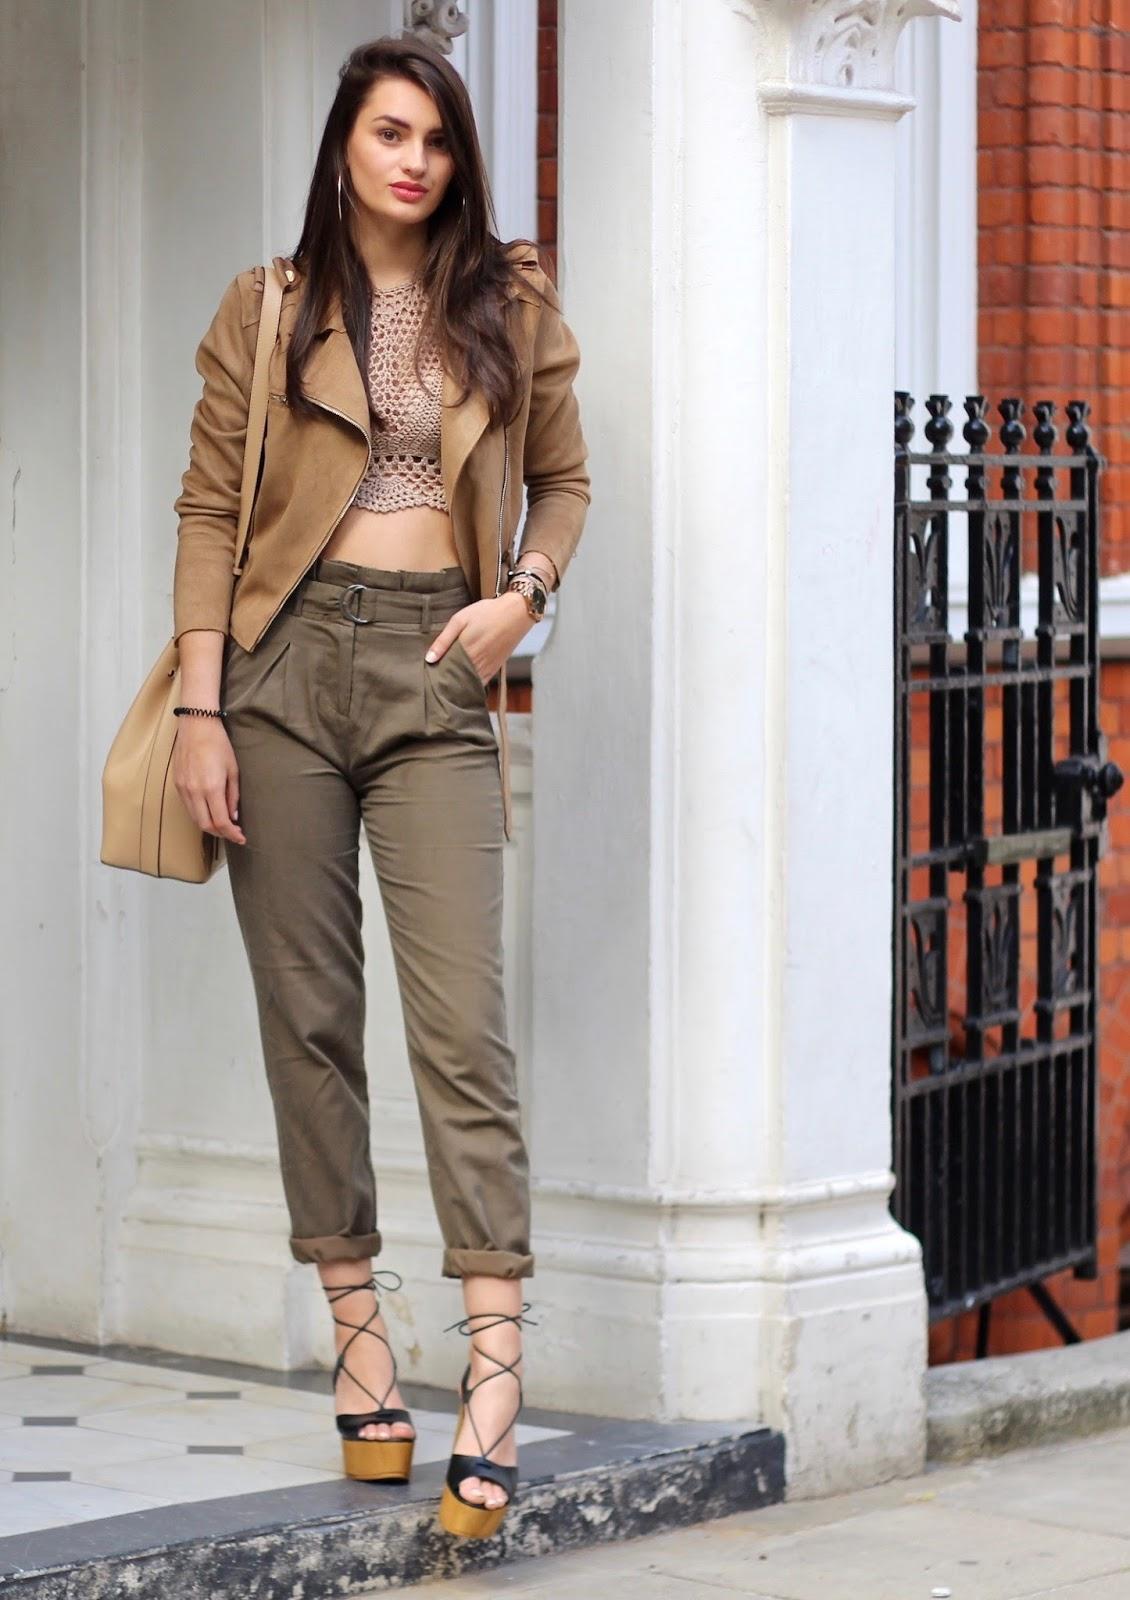 london city style